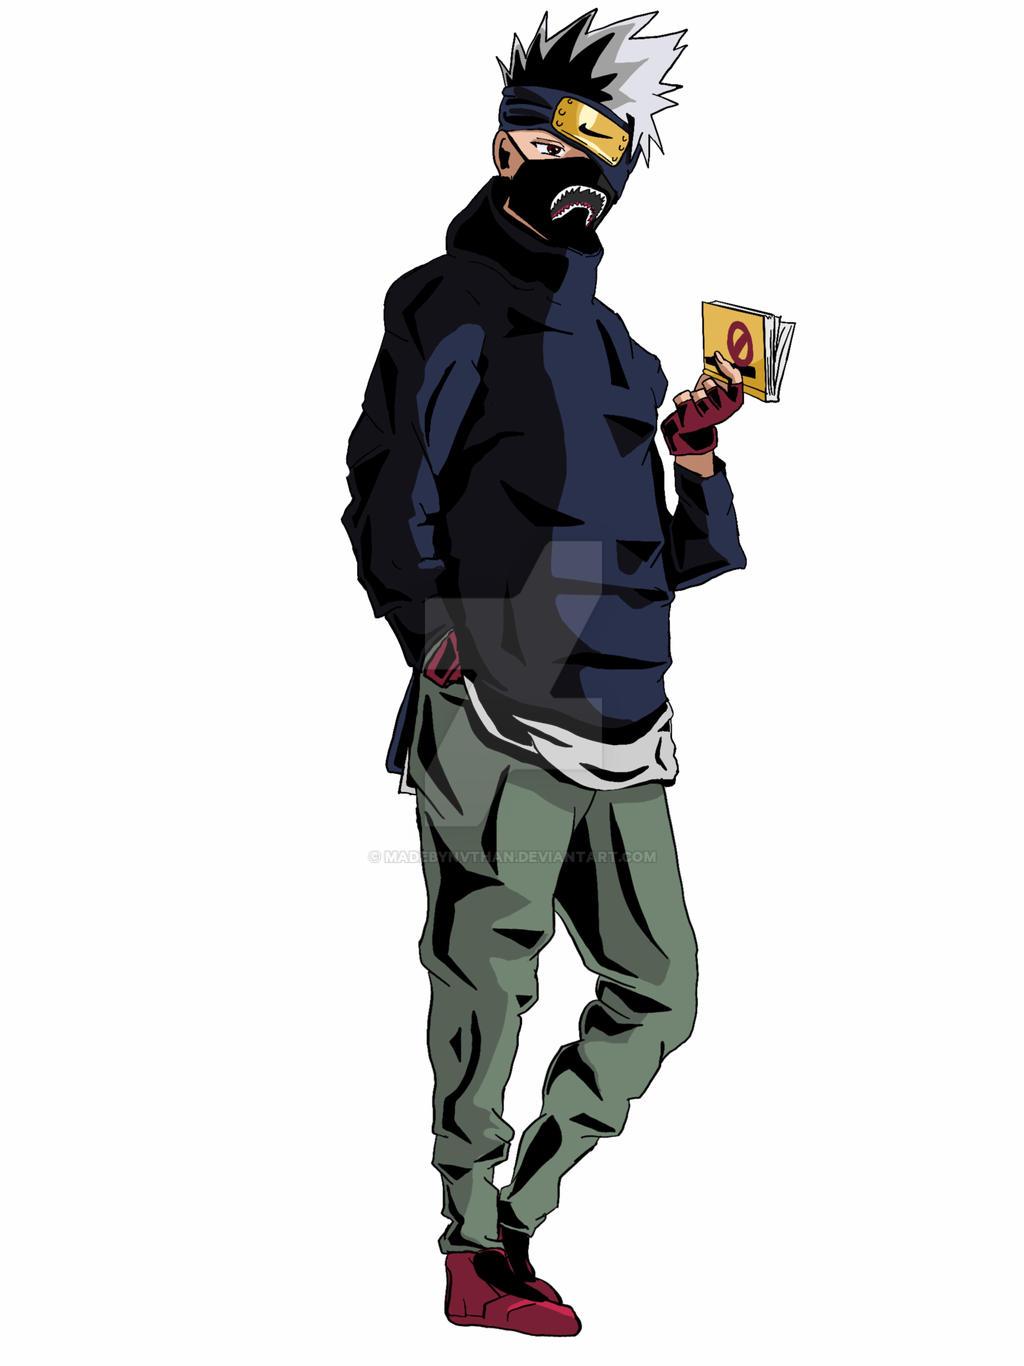 Top Wallpaper Naruto Hypebeast - untitled_artwork_18_by_madebynvthan-dbr7llf  Graphic_74421.jpg